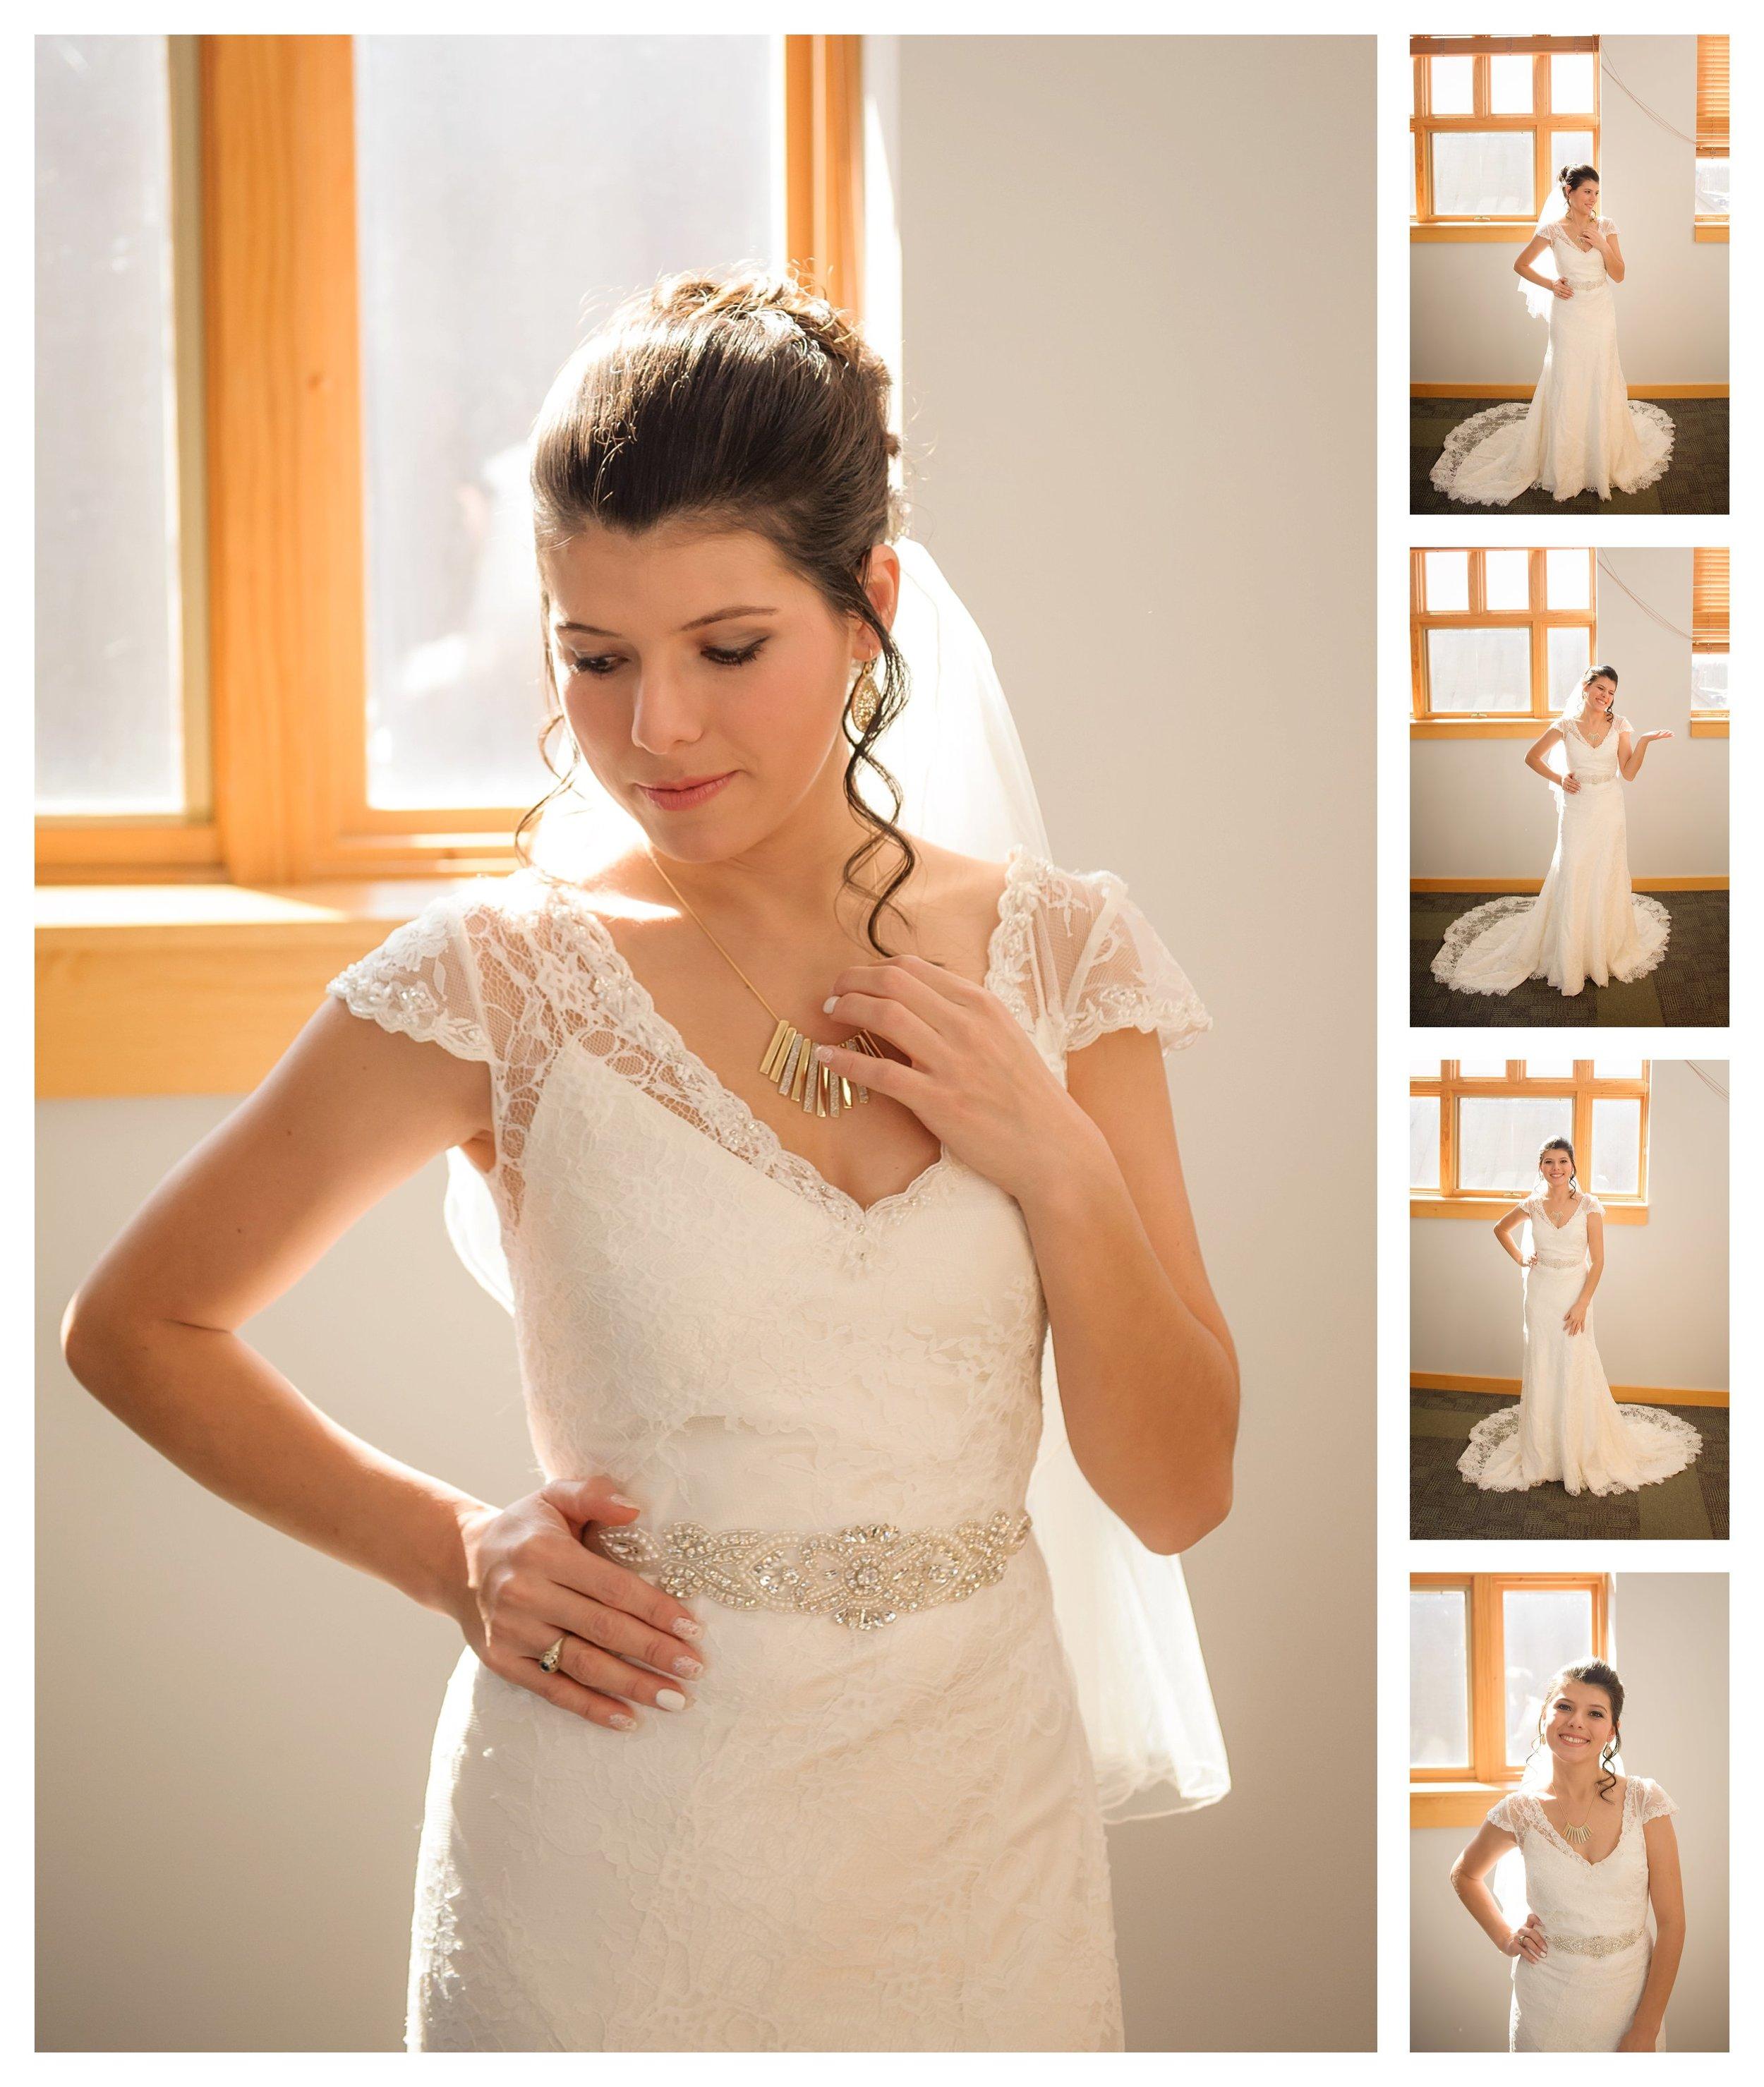 ashland wedding photographer iron river brule wisconsin ps 139 photography jen jensen_0146.jpg